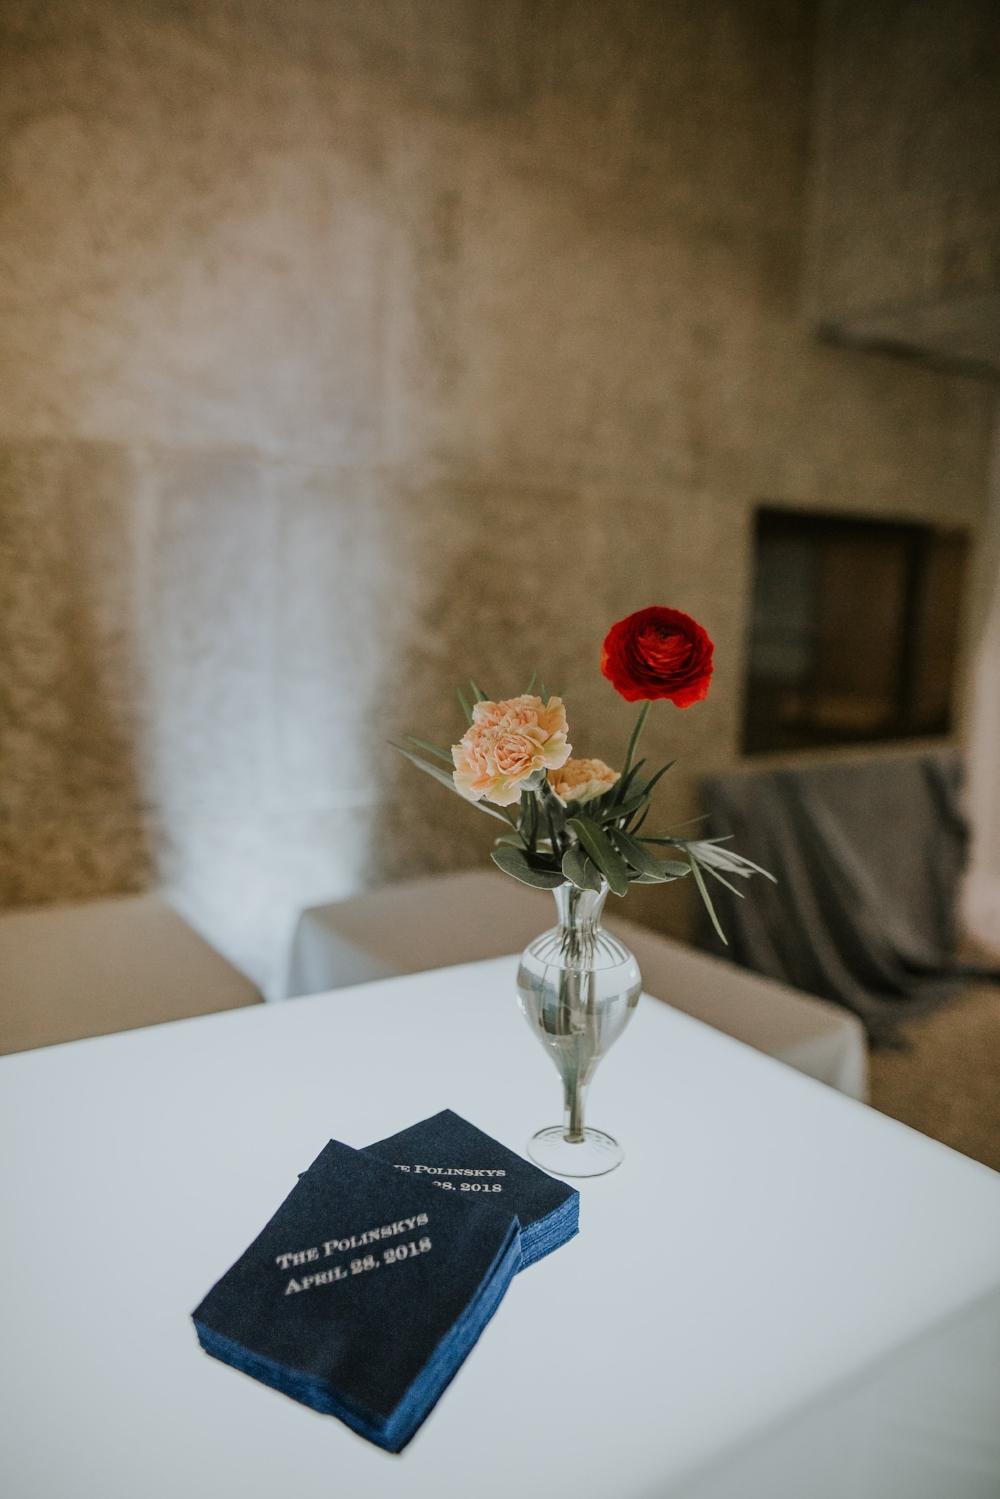 Stem Vase Wedding Decor - Winnipeg Art Gallery Wedding